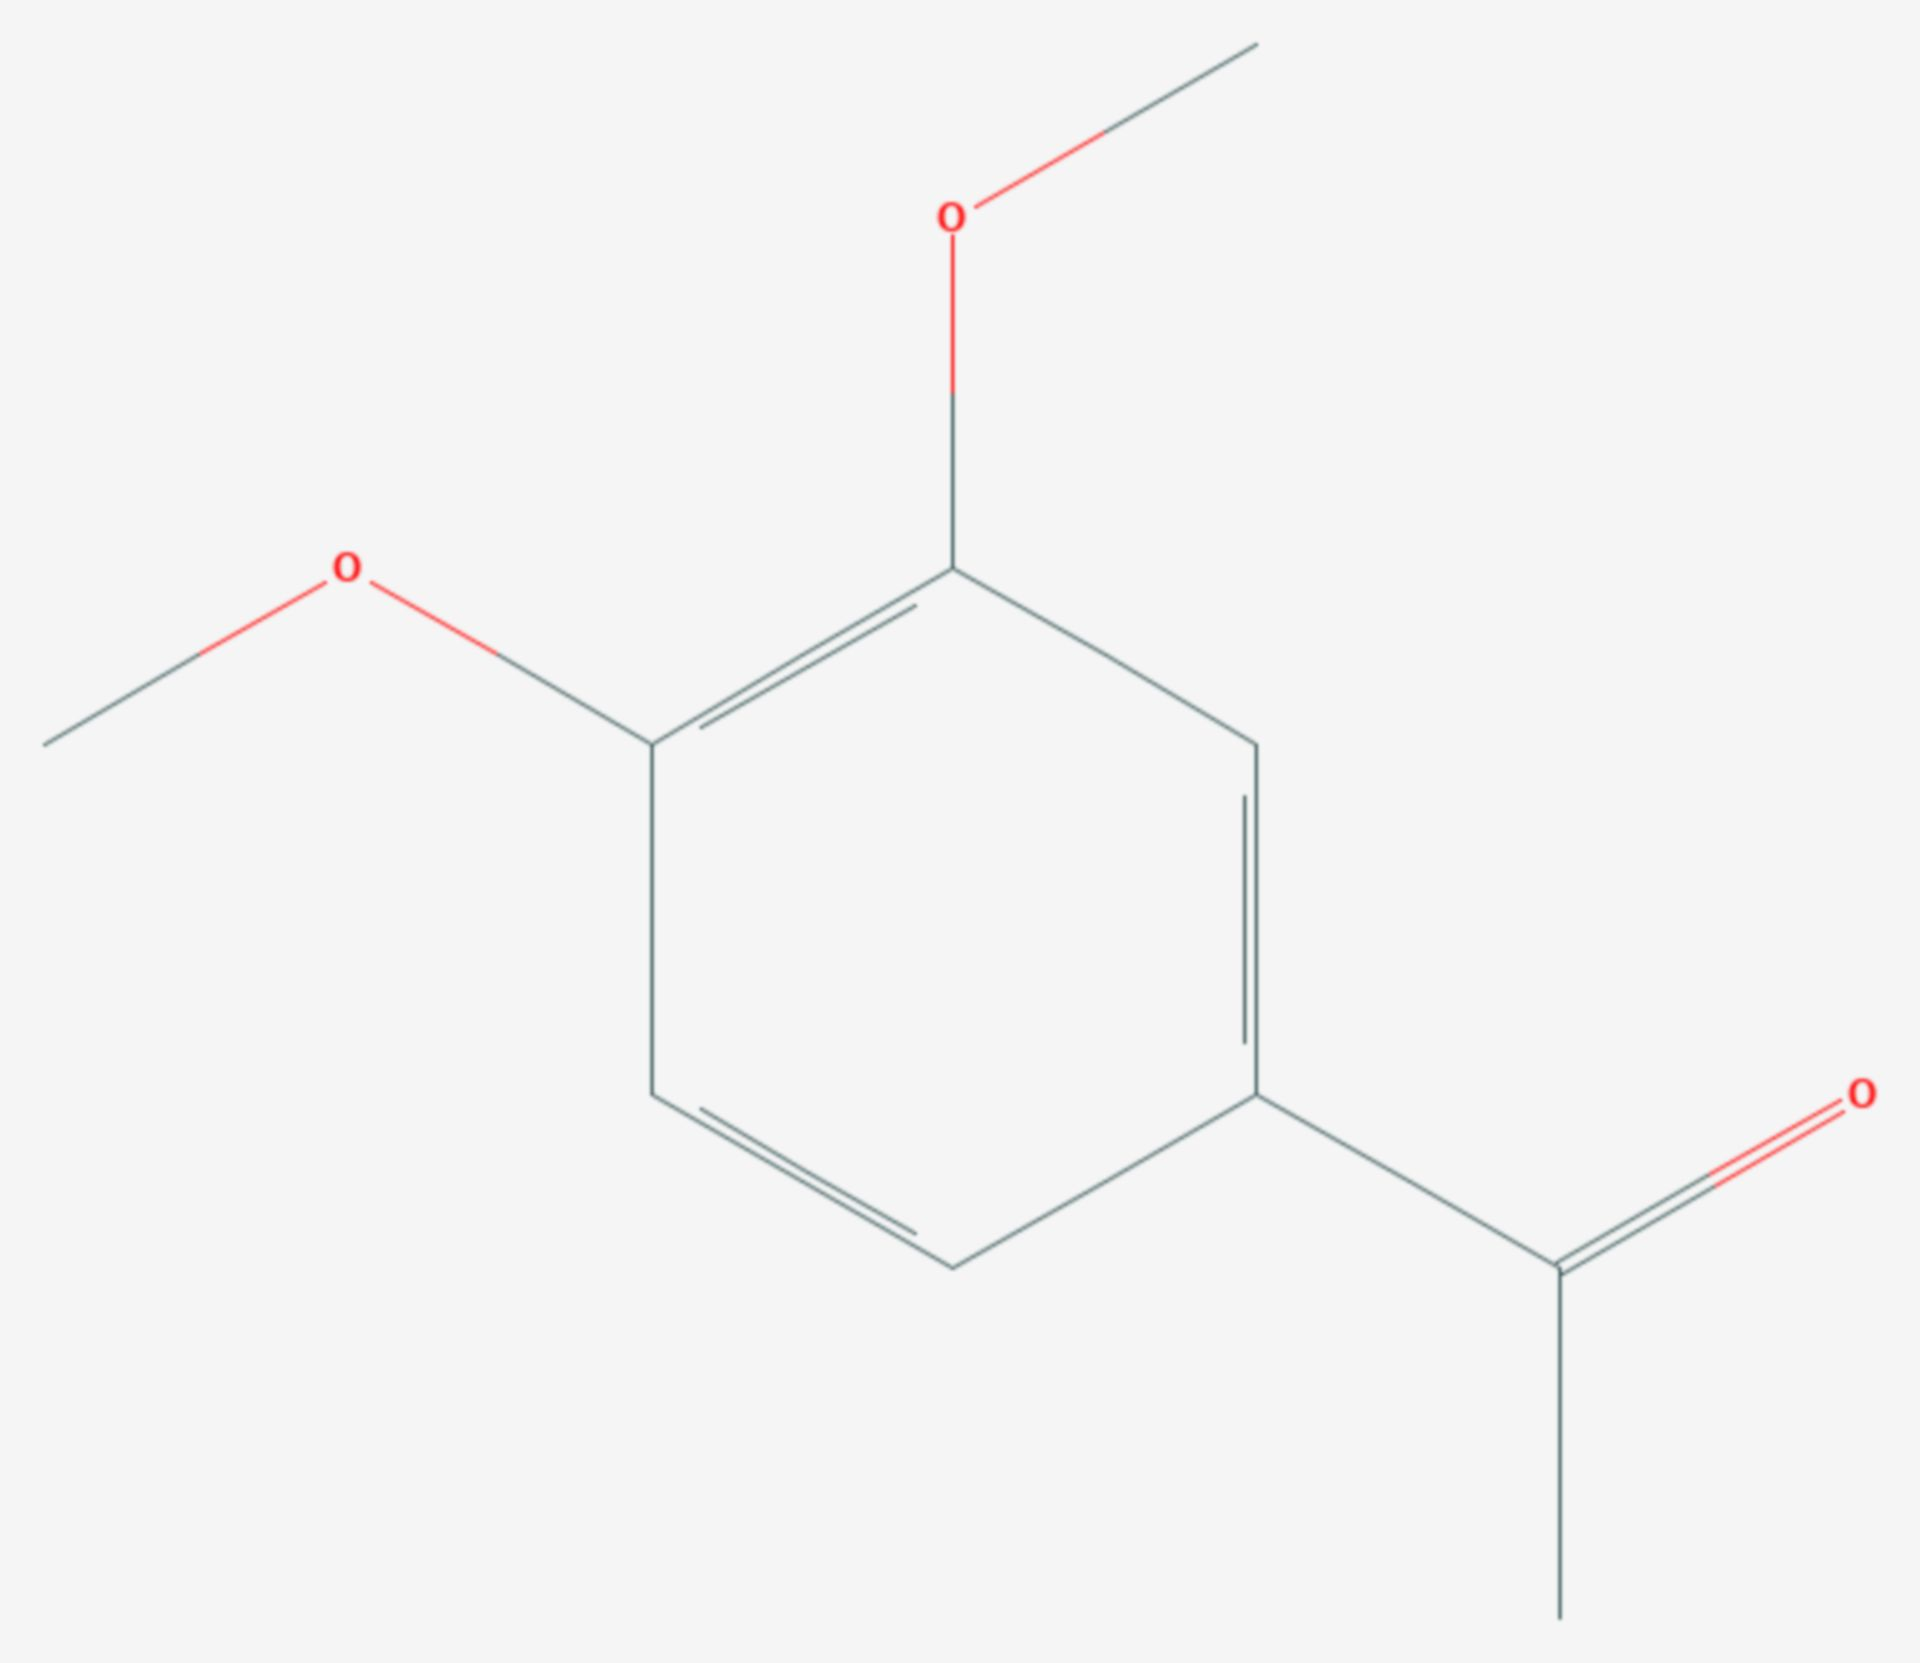 3,4-Dimethoxyacetophenon (Strukturformel)